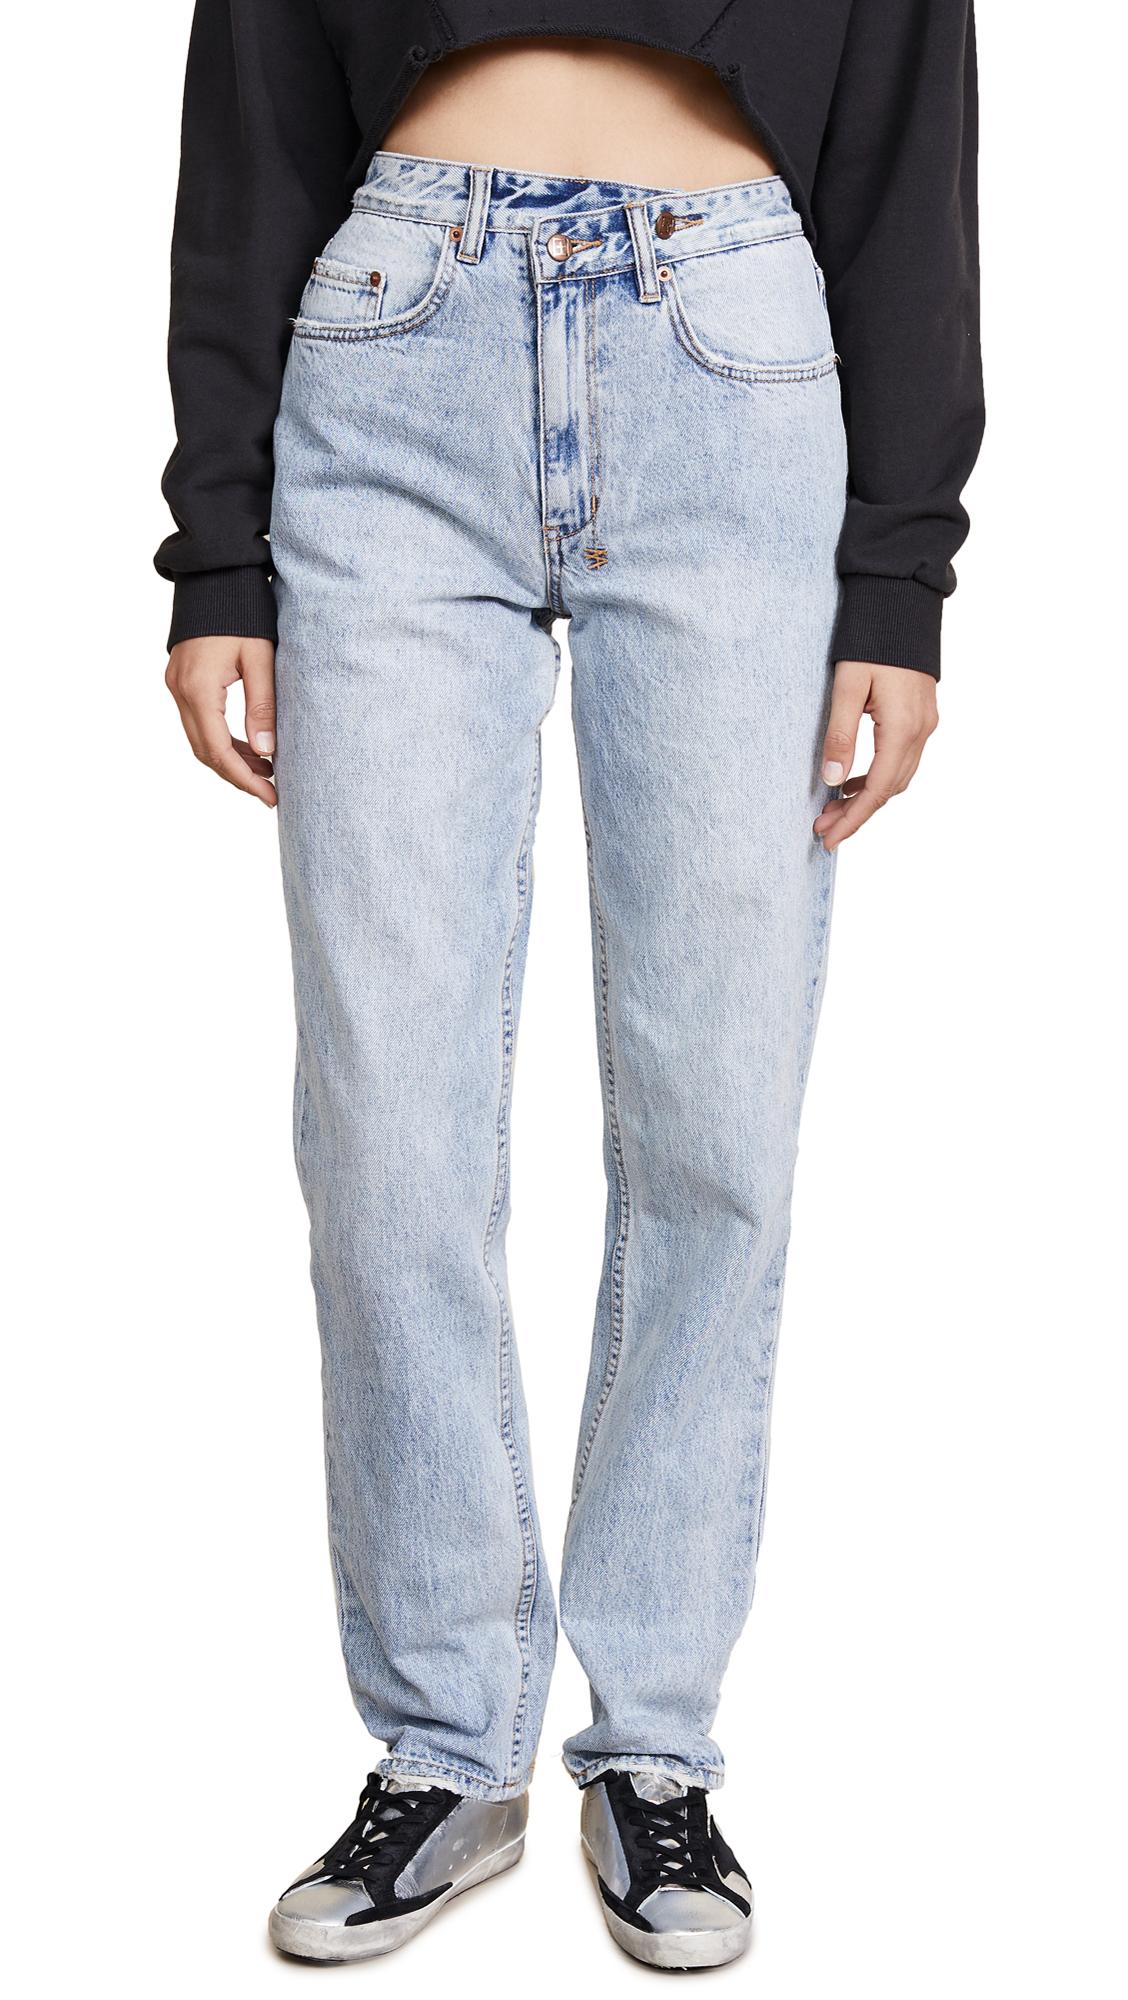 Ksubi Re-Lax Jeans In Chill